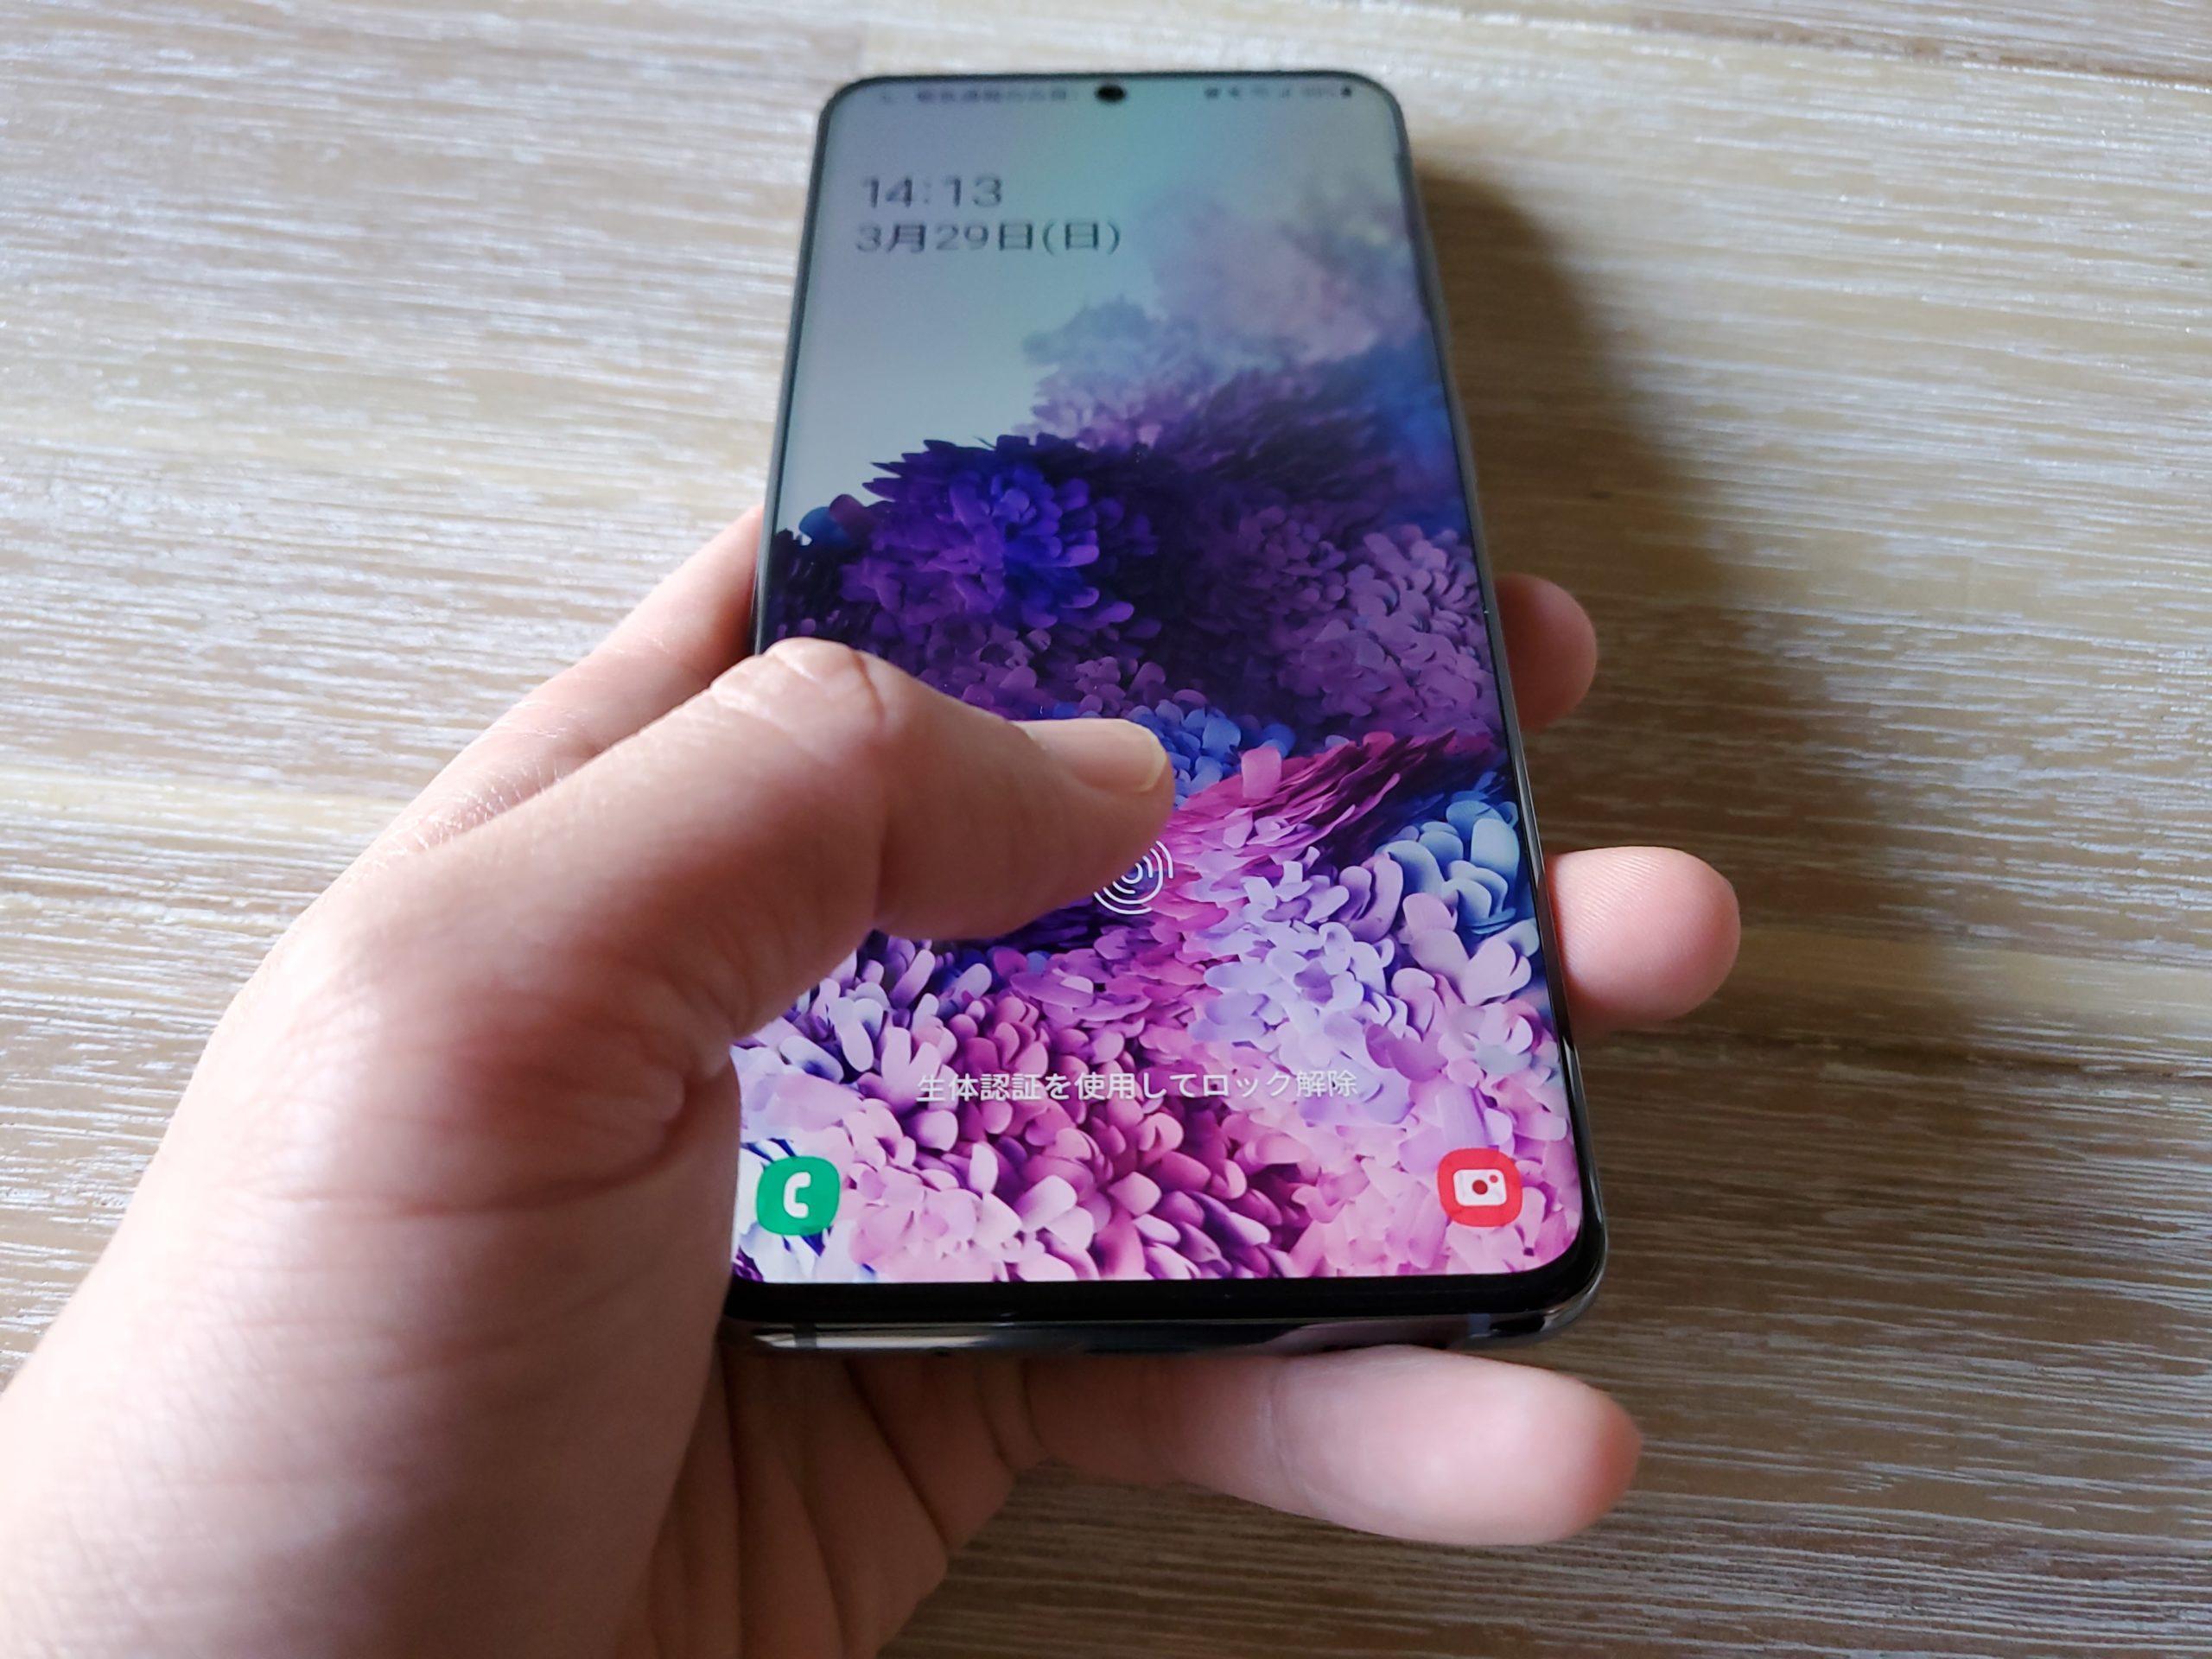 Galaxy S20・Galaxy S20 Ultra 5Gのおすすめケースをタイプ別にご紹介